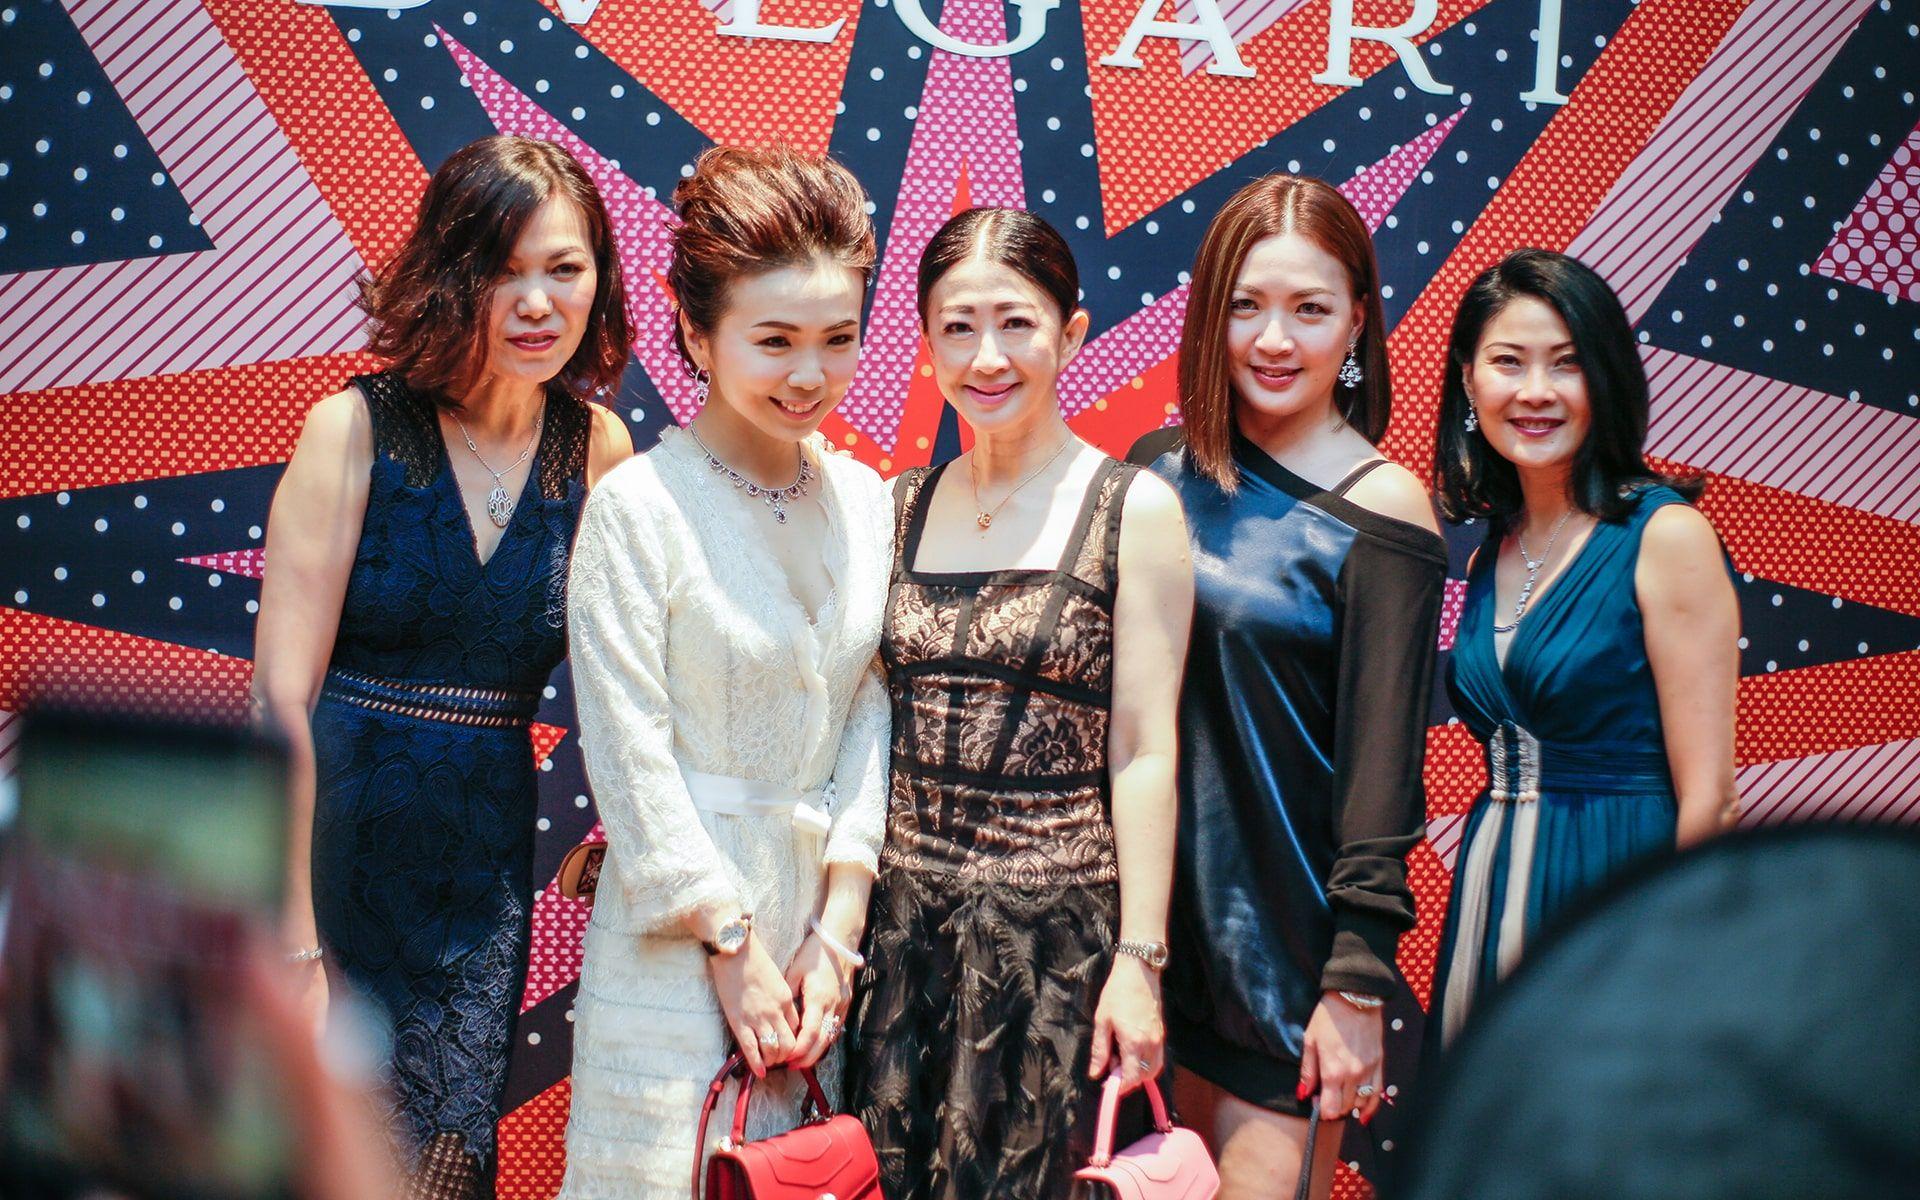 Jenny Cheah, Pauline Gan, Christine Cheah, Cherrie Chin and Renee Ng